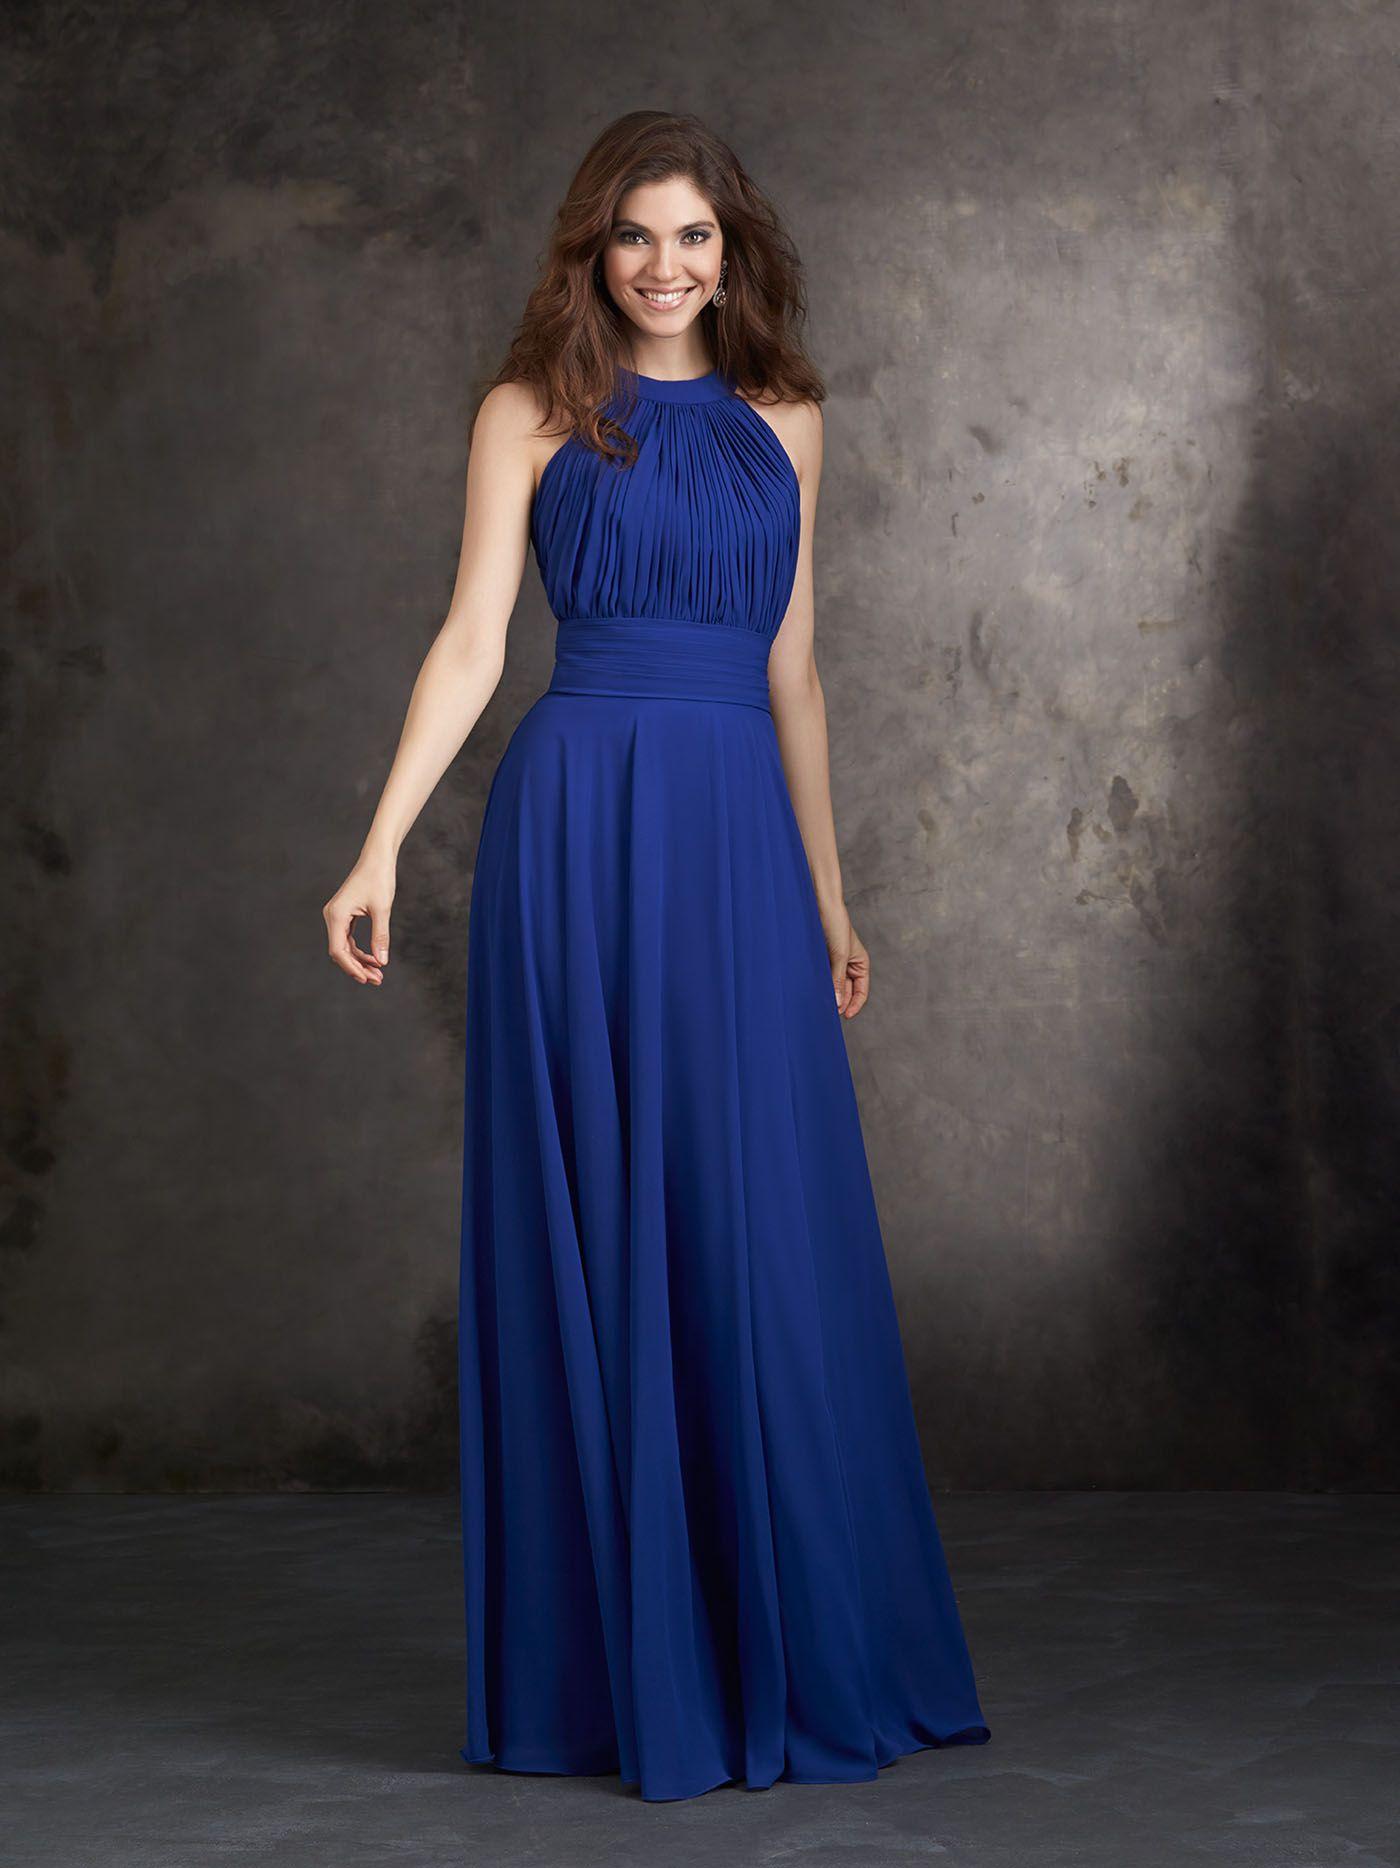 Decorating Wedding Dresses Page 7 White Formal Light Allure Bridesmaidroyal Blue